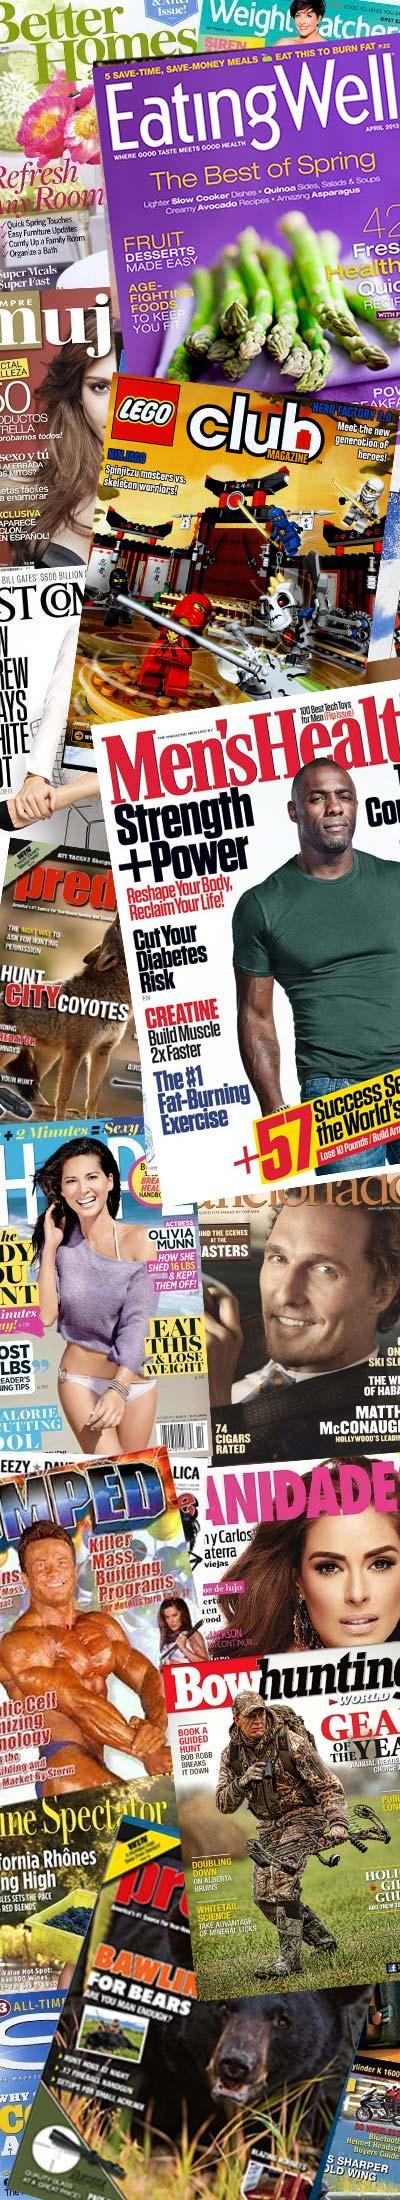 29 FREE Magazines Today